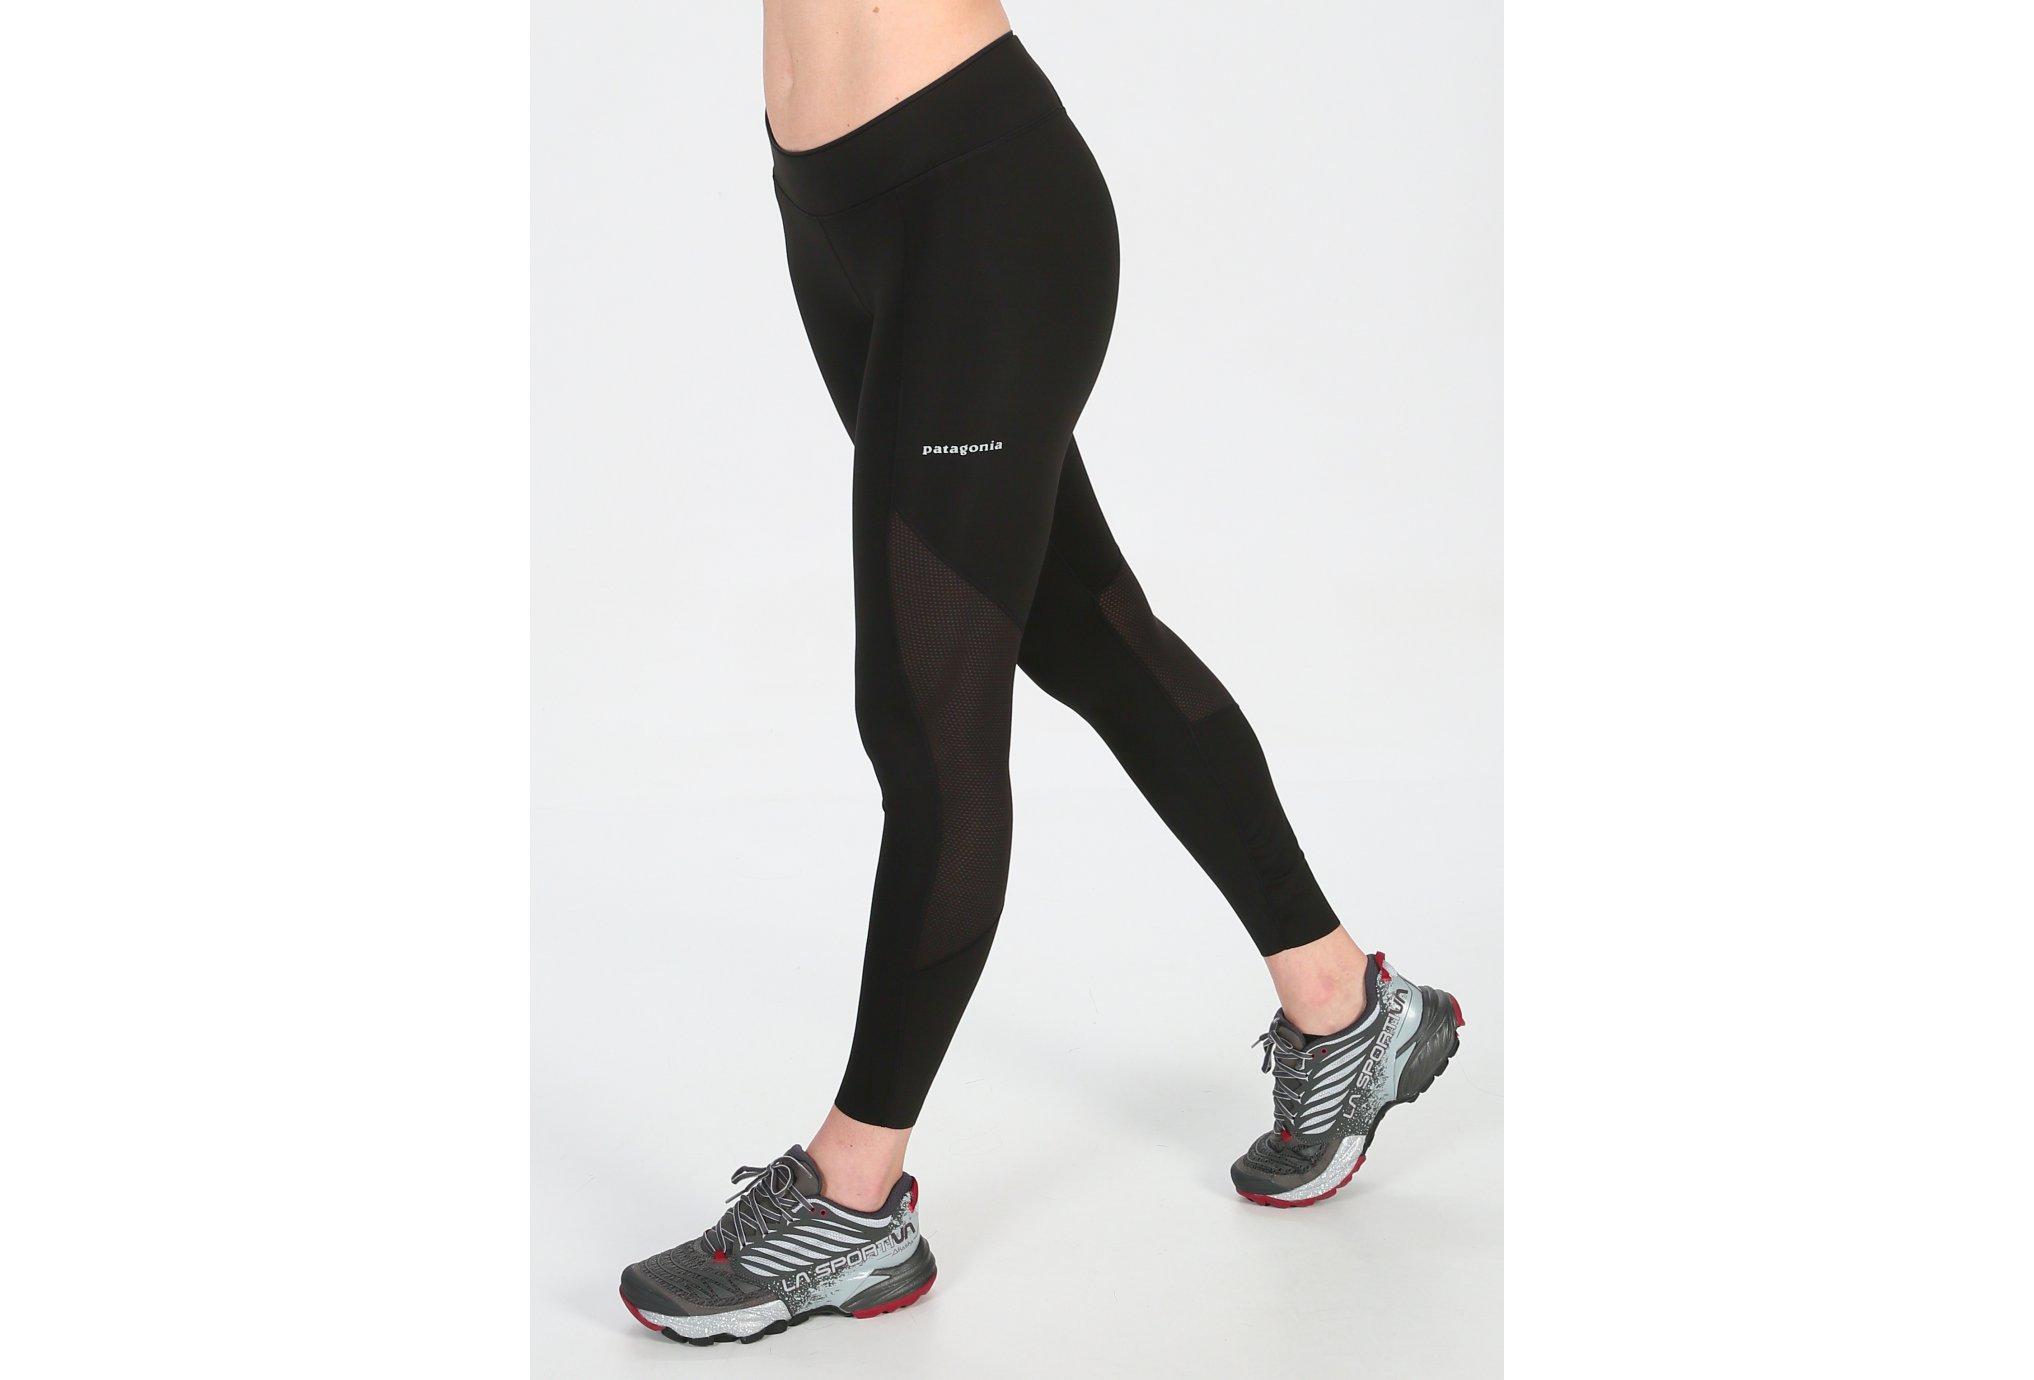 Patagonia Endless Run W vêtement running femme